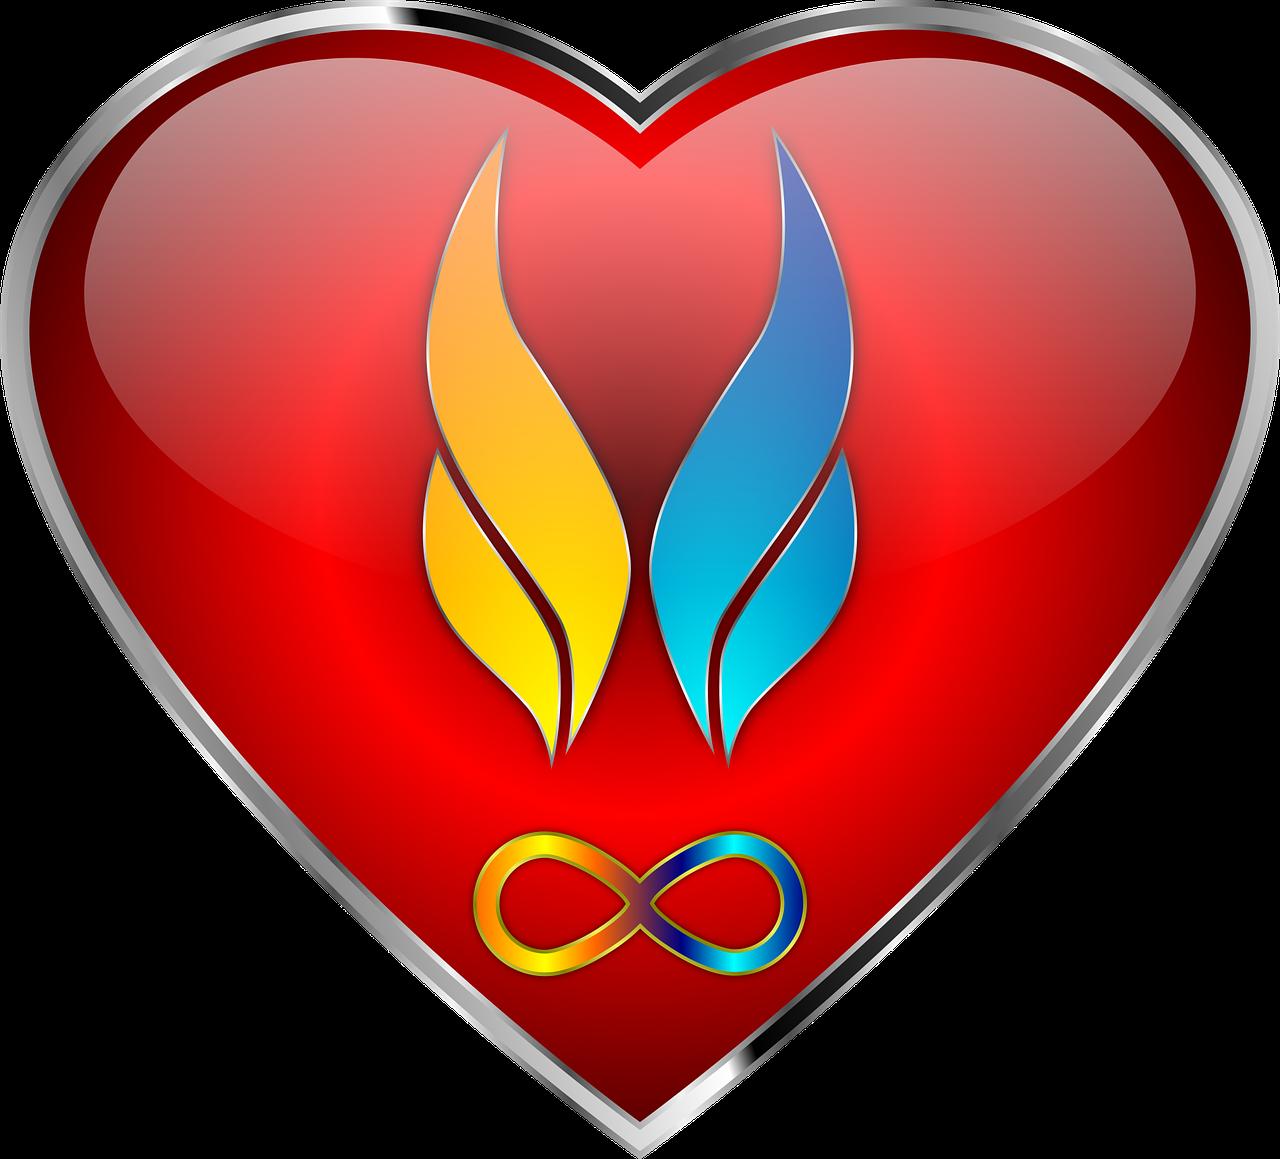 Twin flames,heart,soul,infinity,love - free photo from needpix com